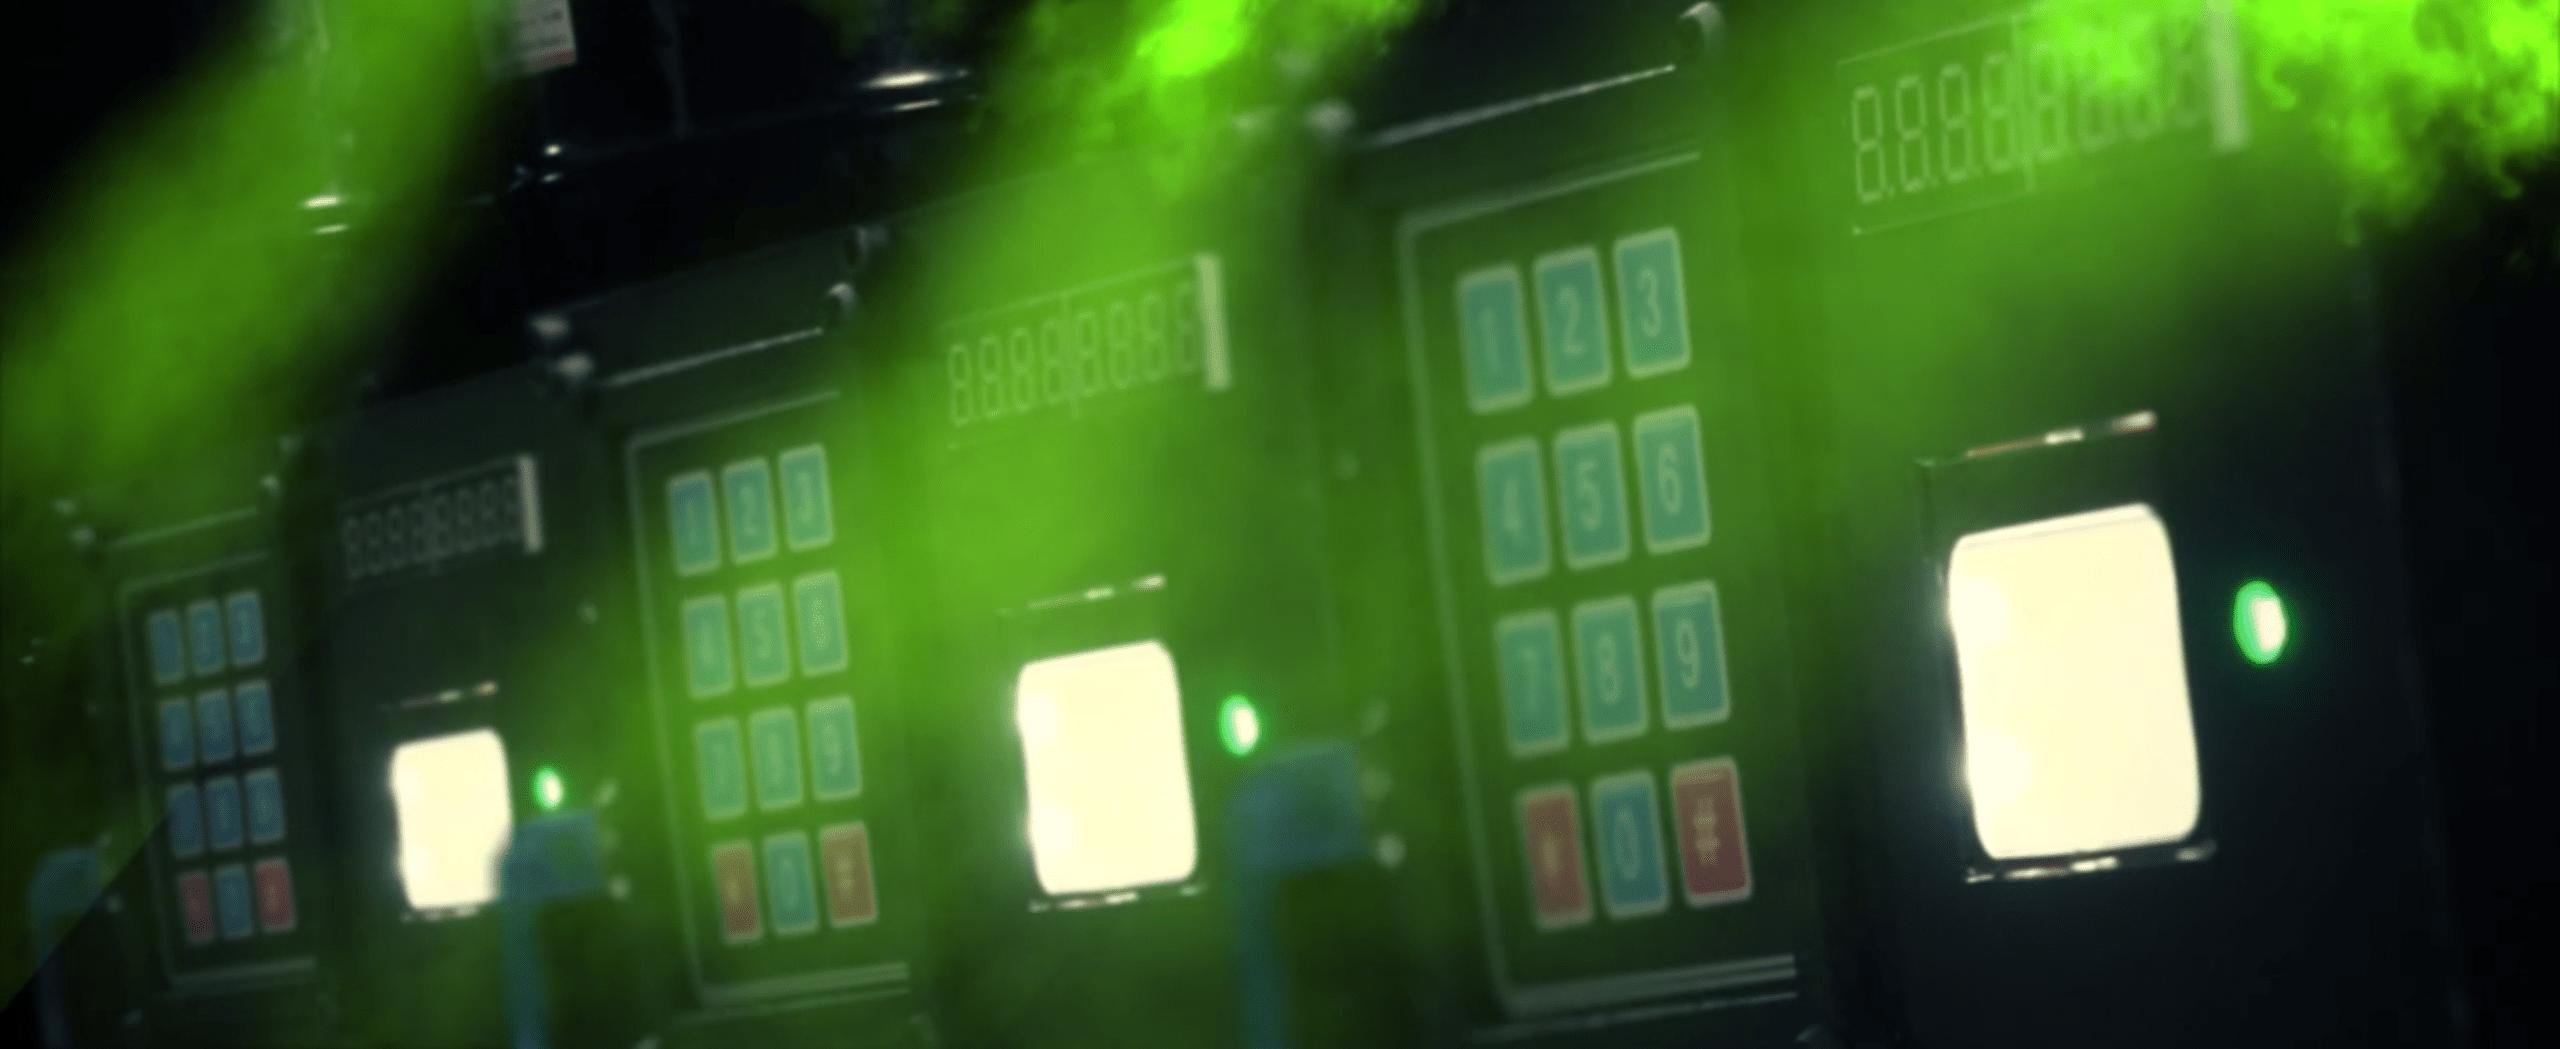 Countdown pads emitting gas